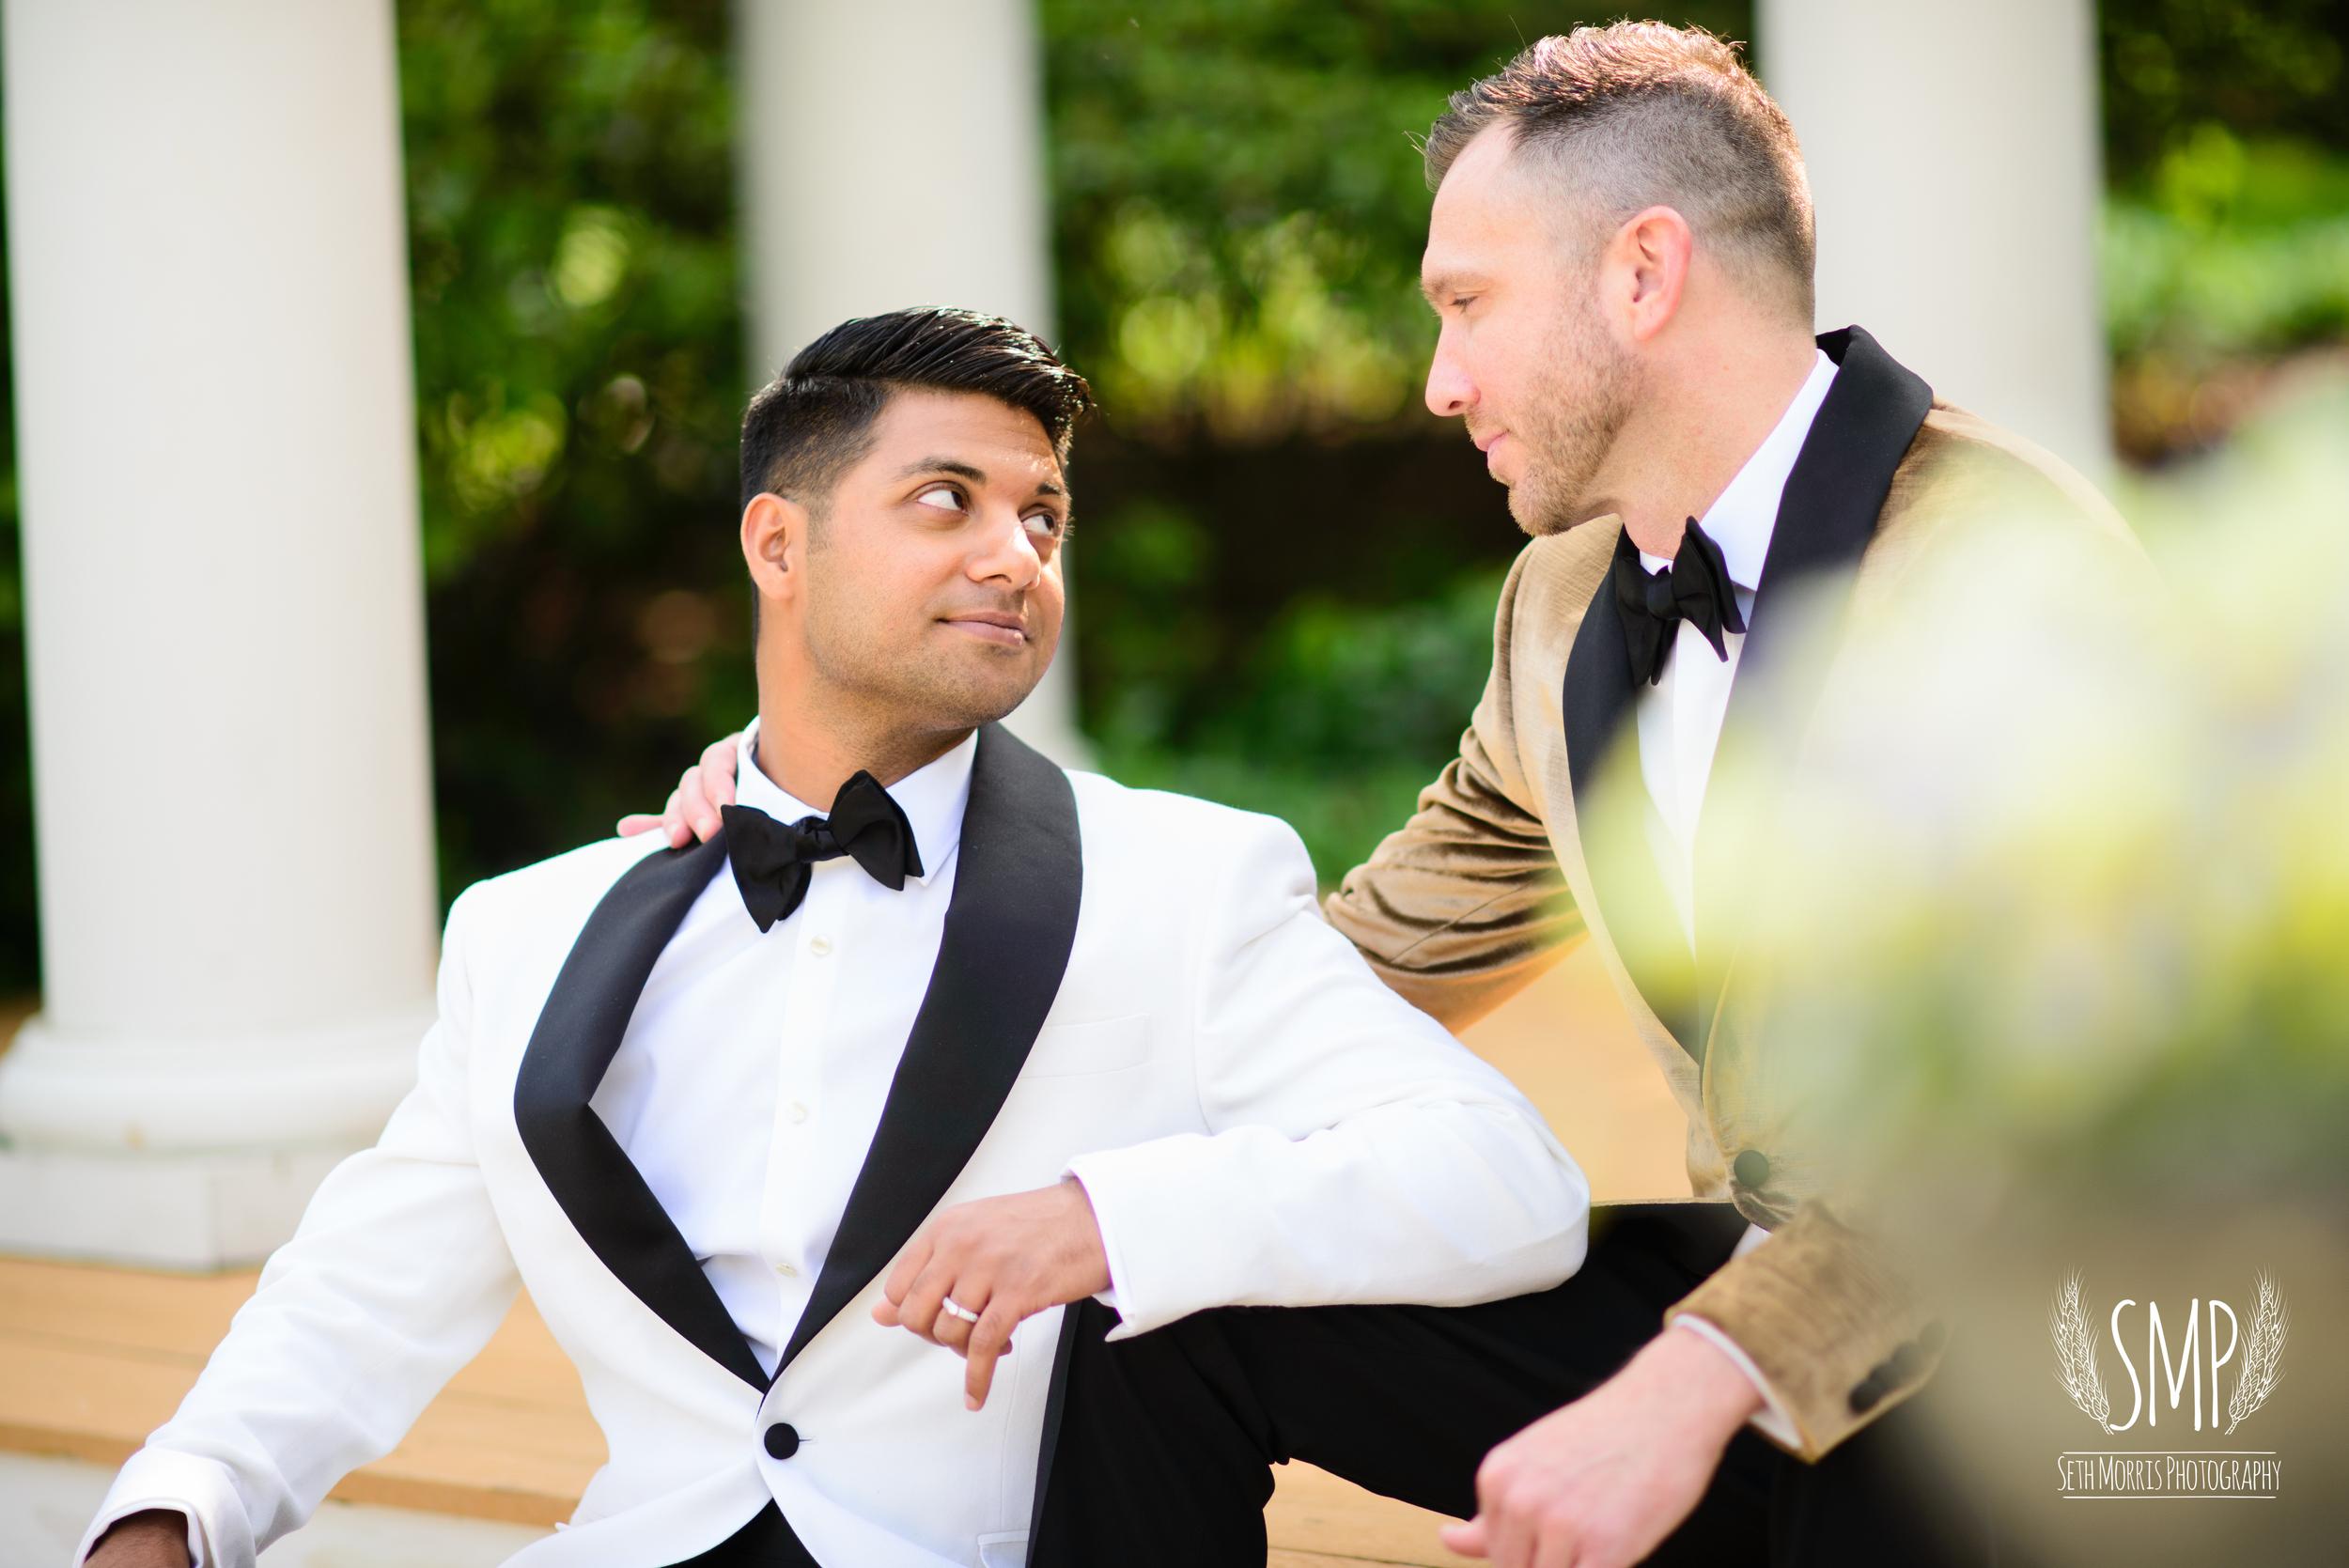 same-sex-wedding-photographer-chicago-illinois-31.jpg